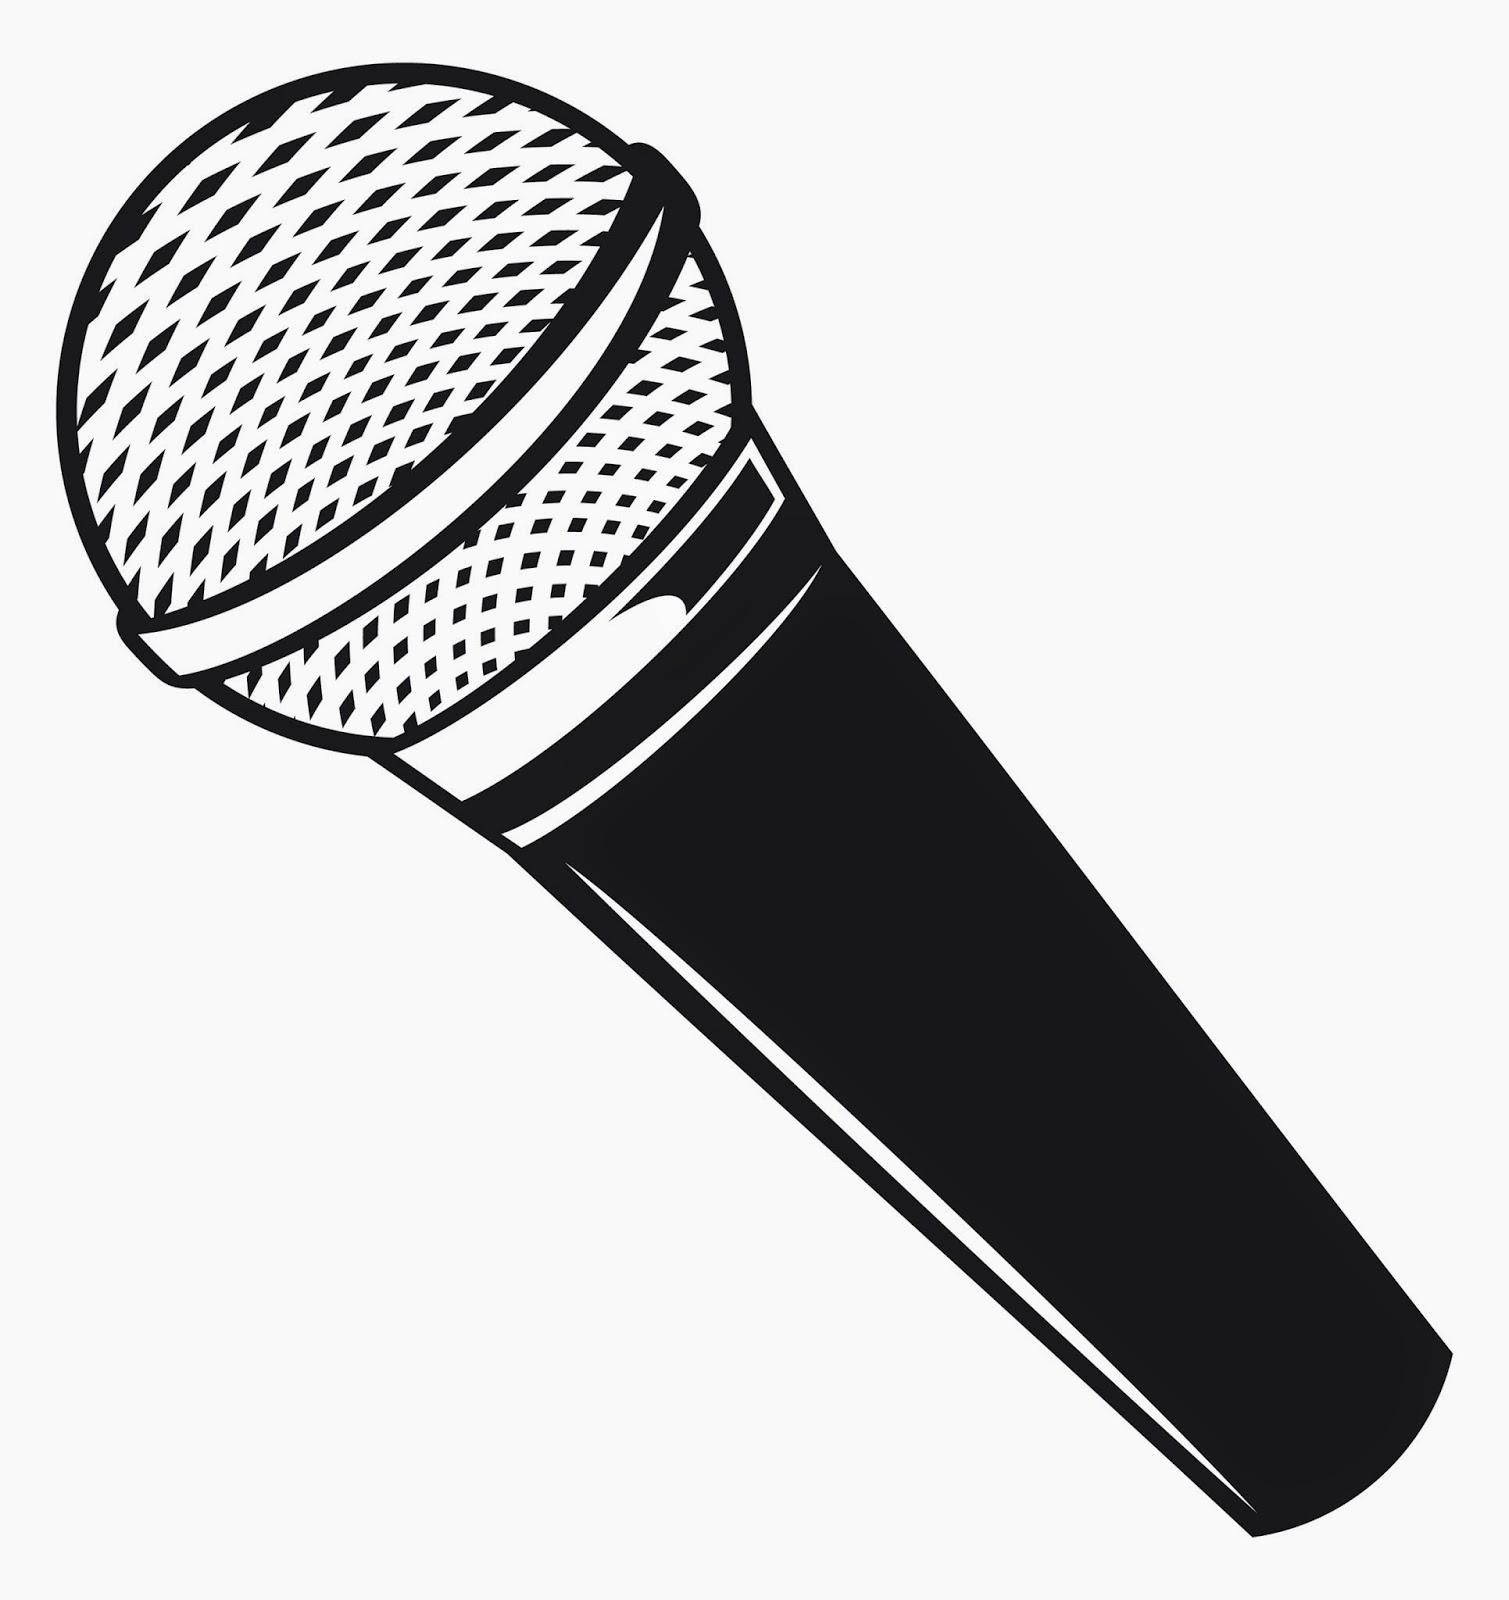 capri sun roarin u0026 39  waters microphones  u0026 rice crispy blimp